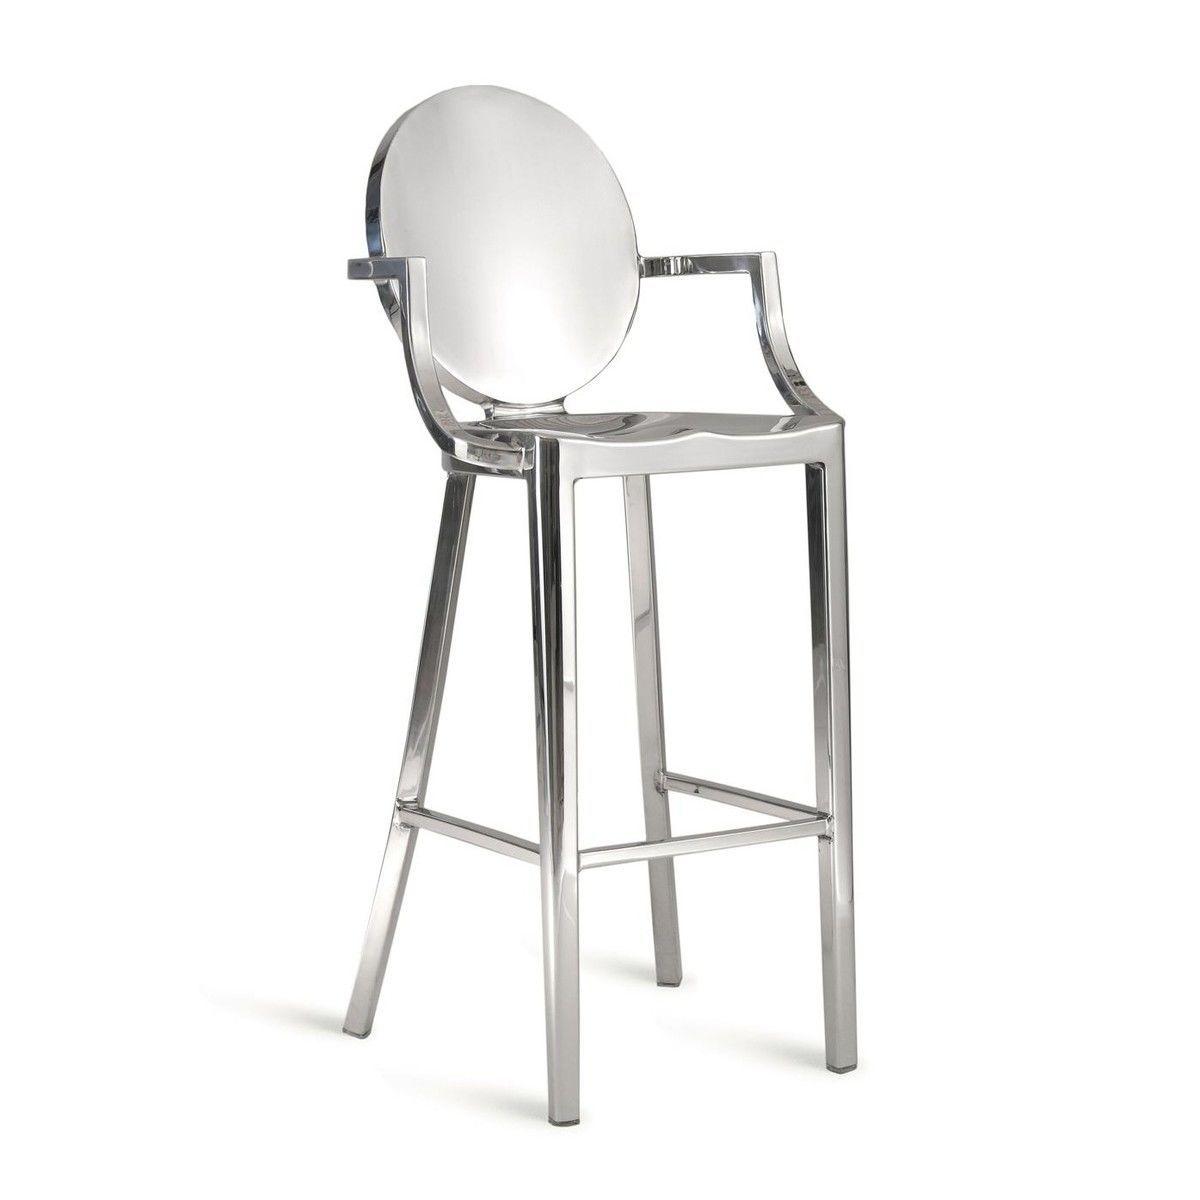 king kong camping chair green papasan barstool with armrests emeco ambientedirect